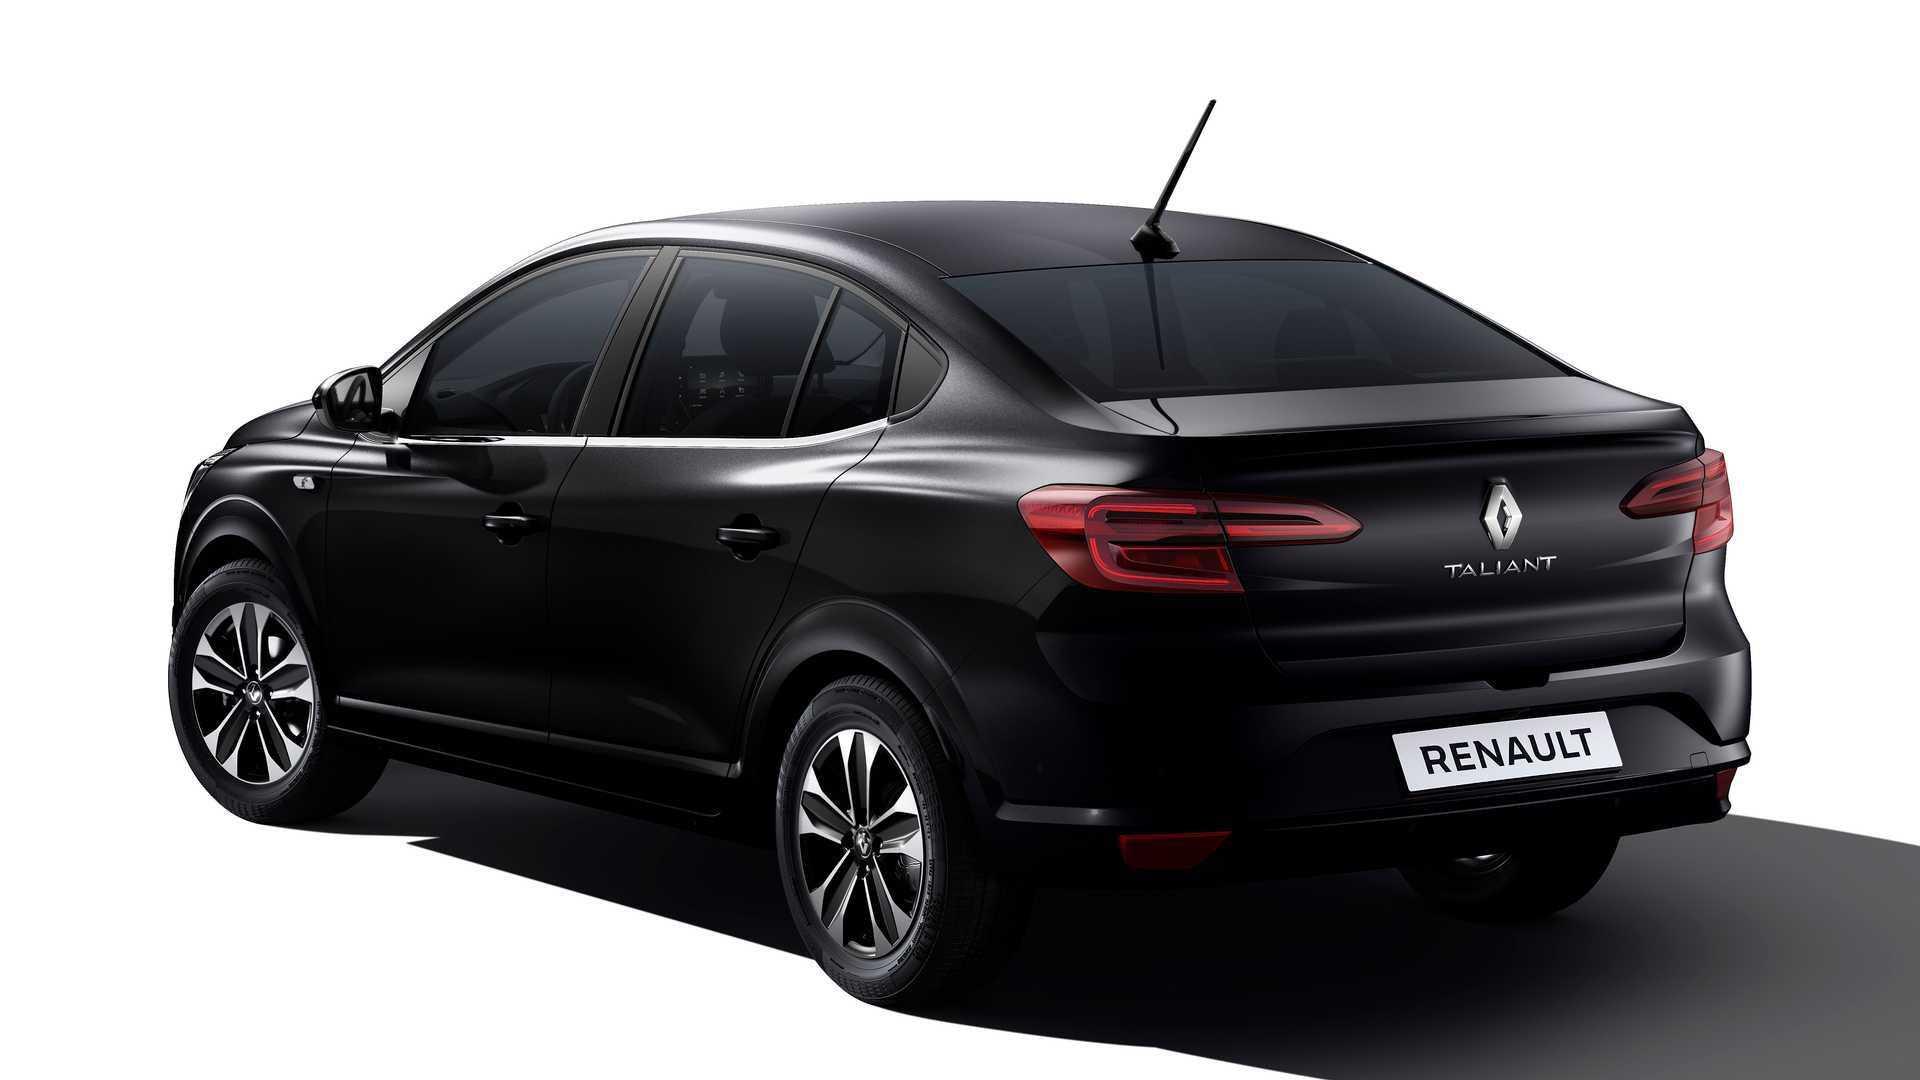 2021_Renault_Taliant-0008